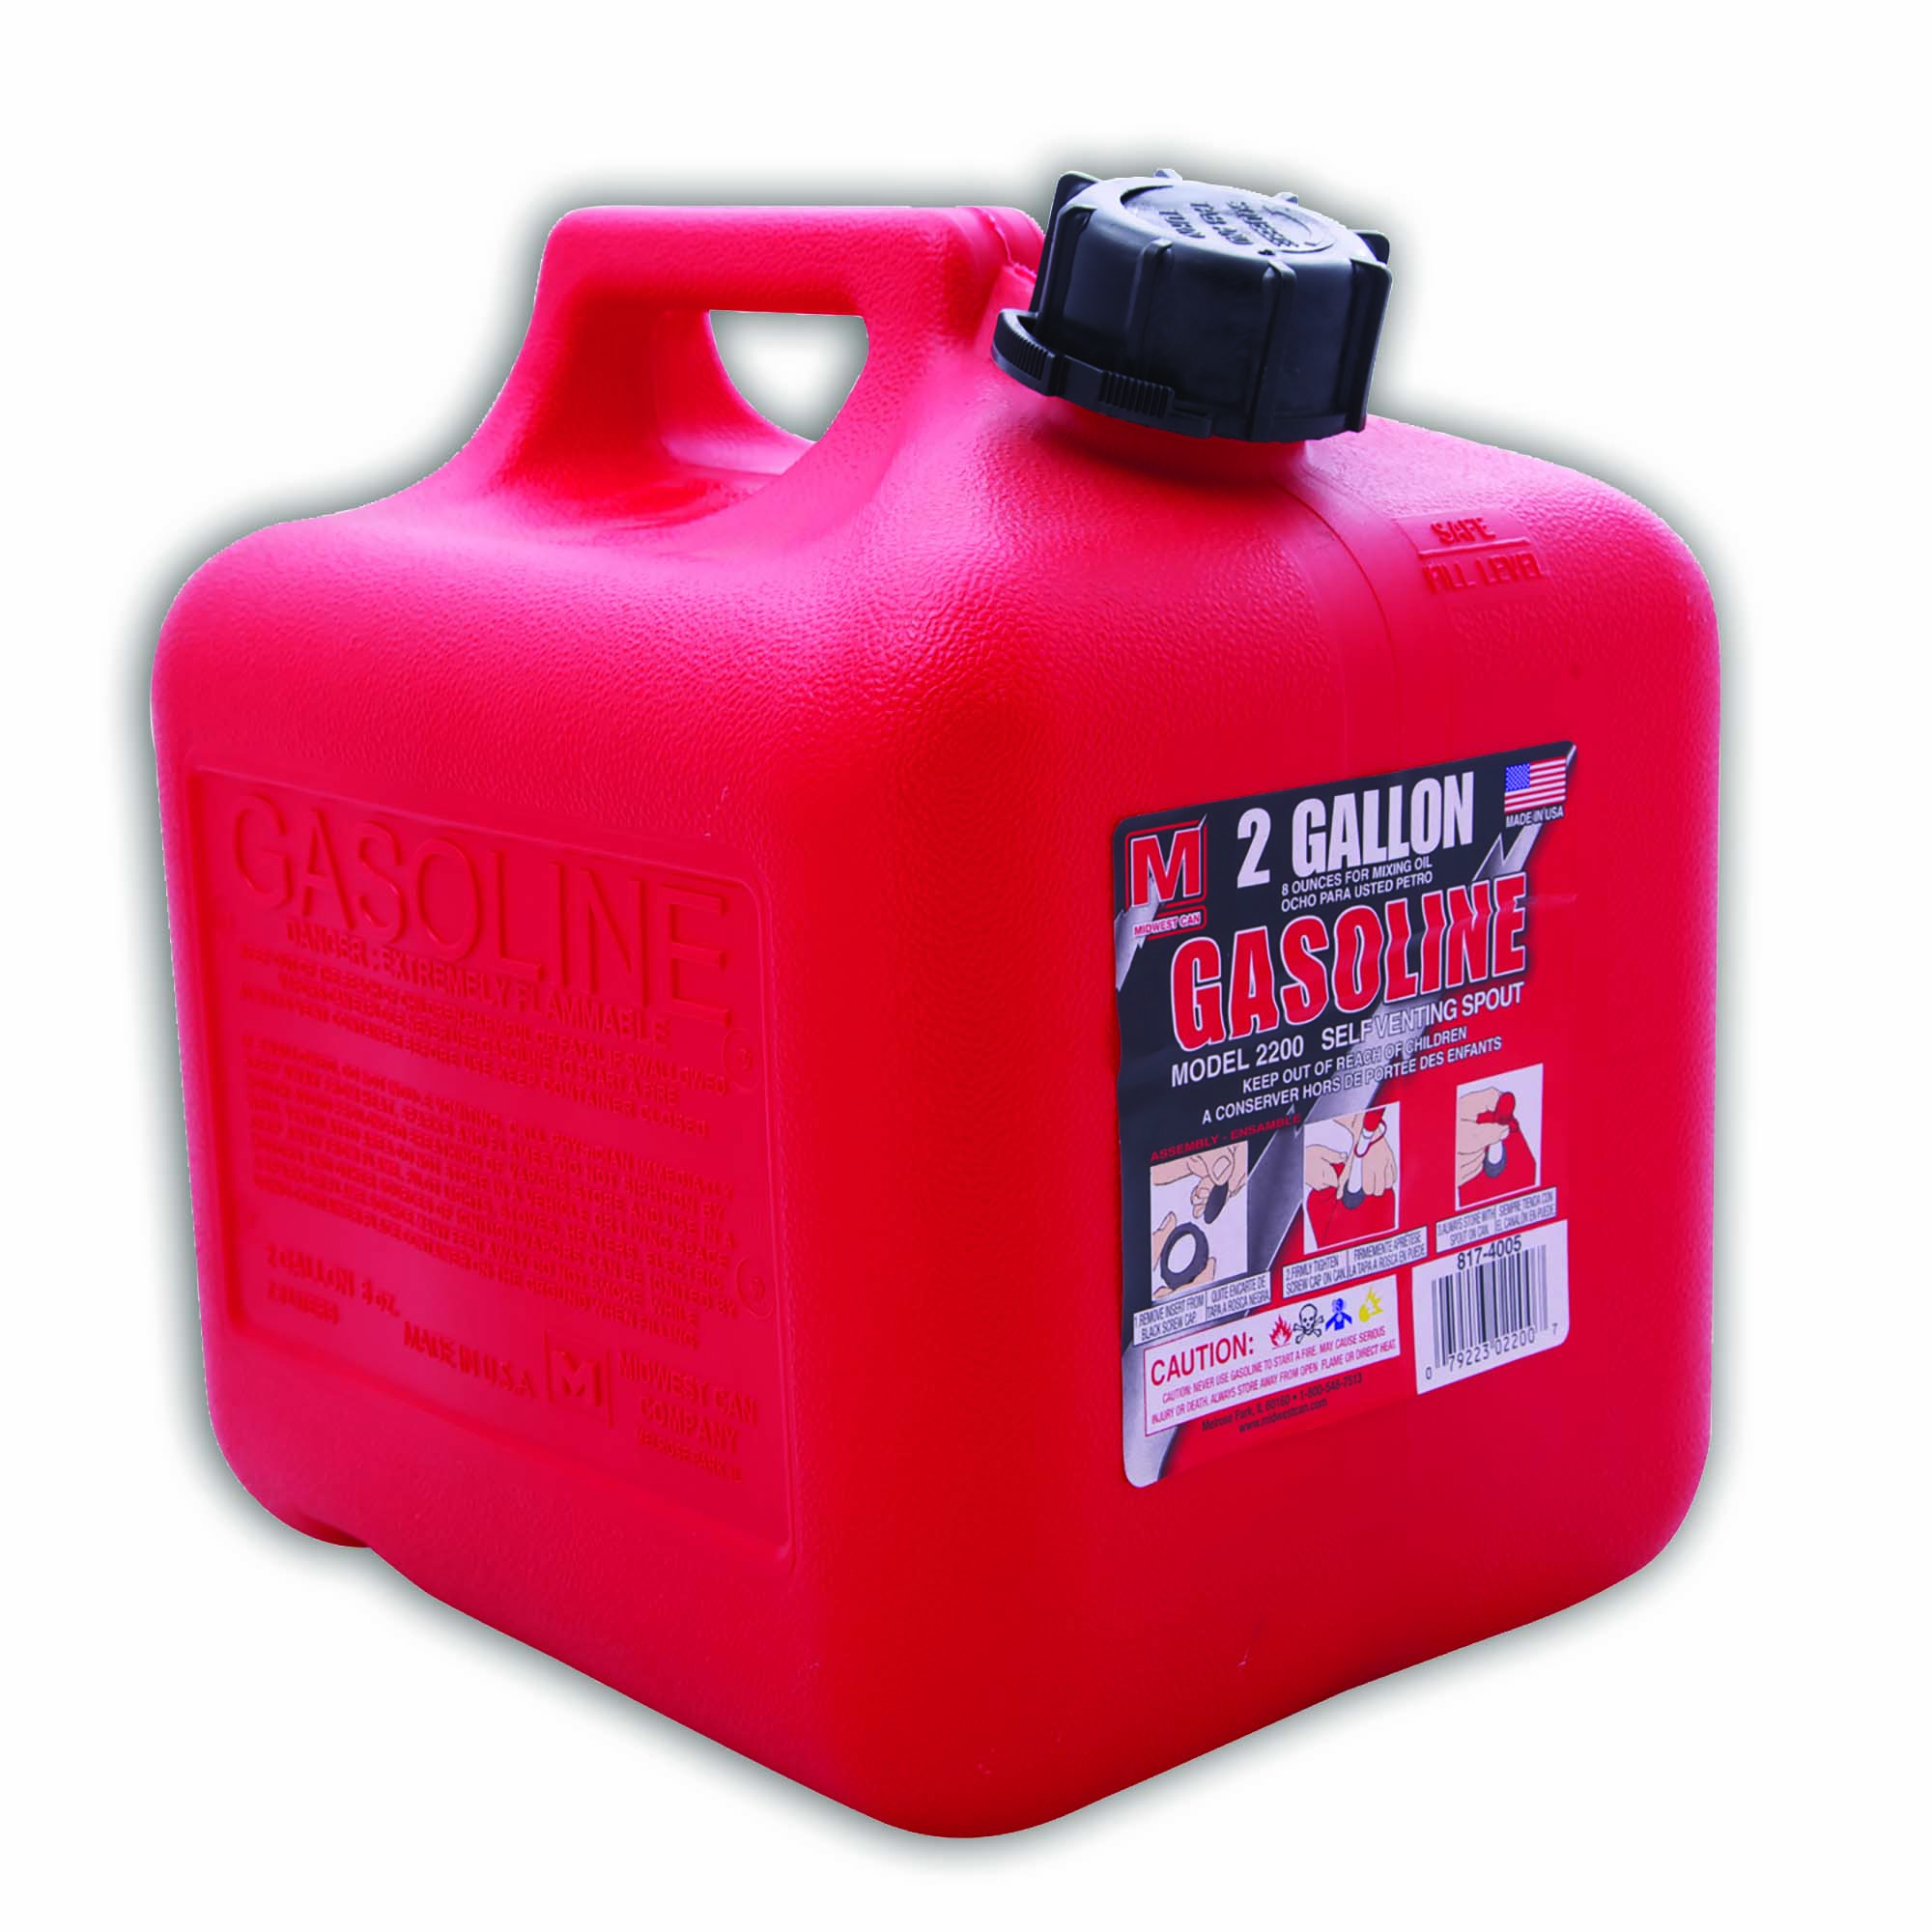 Tanque para gasolina modelo 1100 de 1gl auto ventilante